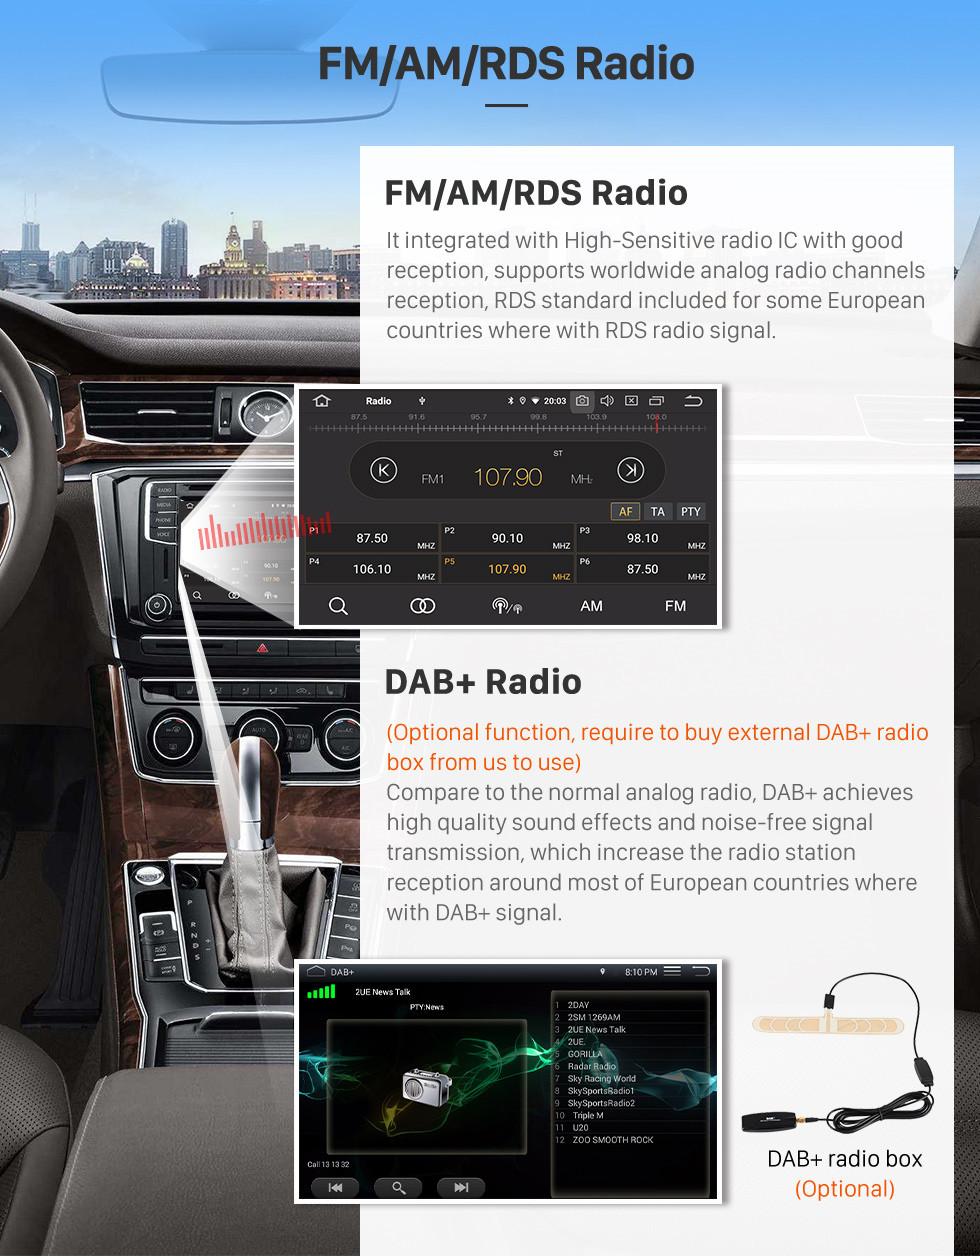 Seicane Écran tactile HD 2014-2016 Geely Emgrand EC7 Android 9.0 Radio de navigation GPS 9 pouces avec Bluetooth WIFI AUX USB Support Carplay DAB + DVR OBD2